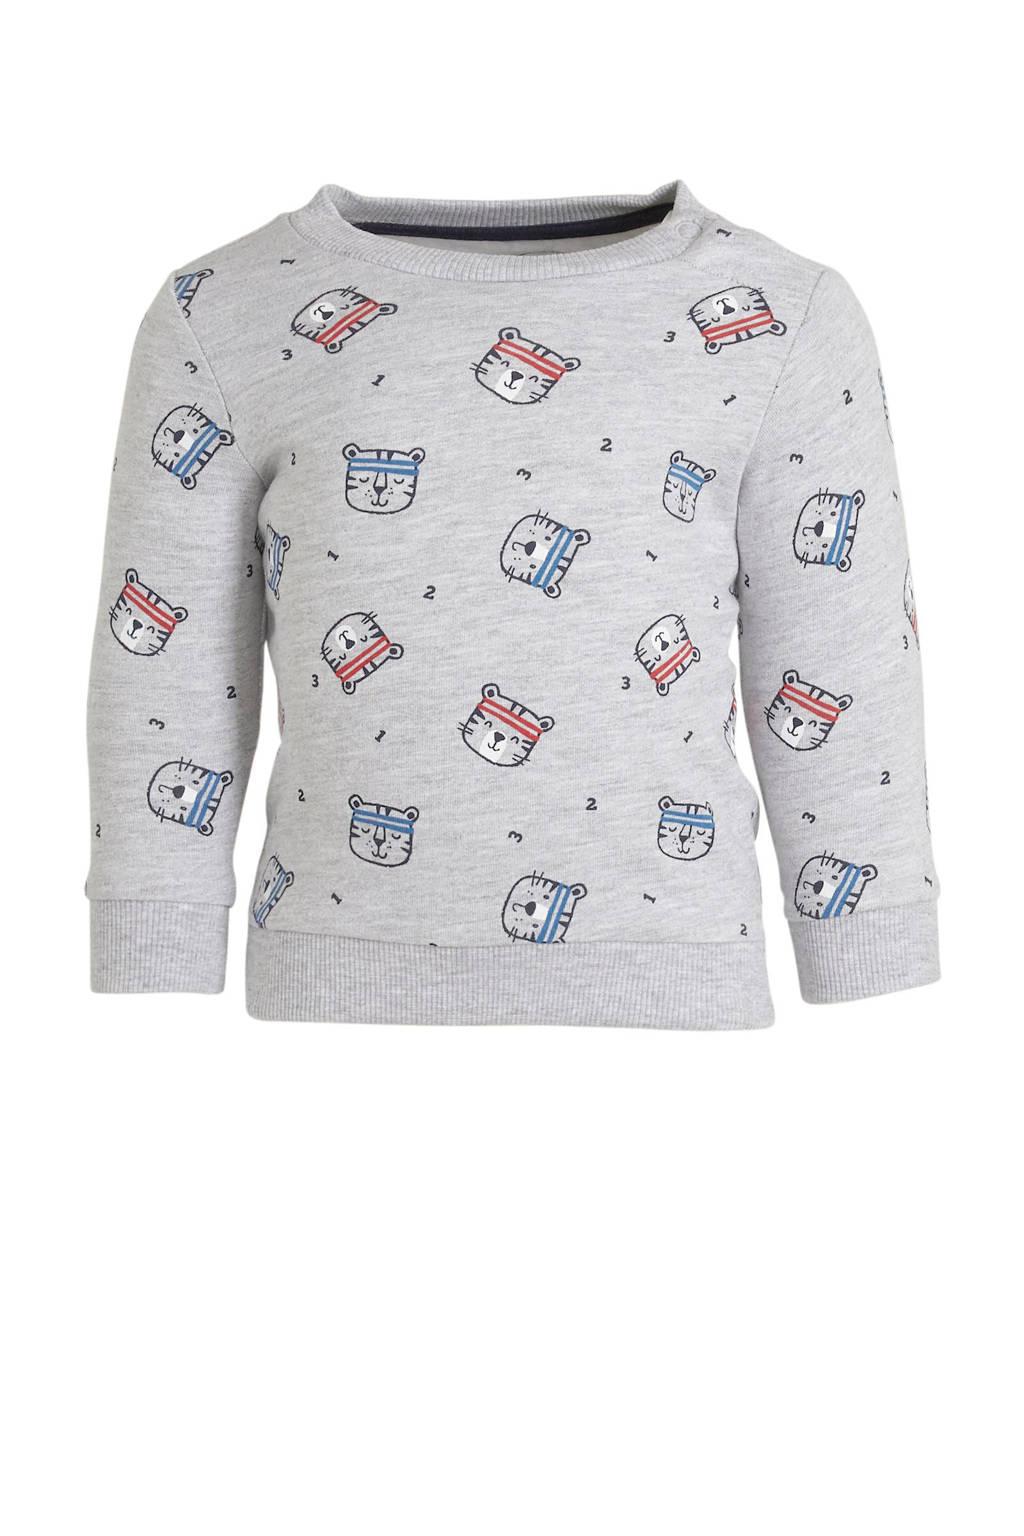 C&A Baby Club sweater met all over print grijs melange/zwart/donkerblauw, Grijs melange/zwart/donkerblauw